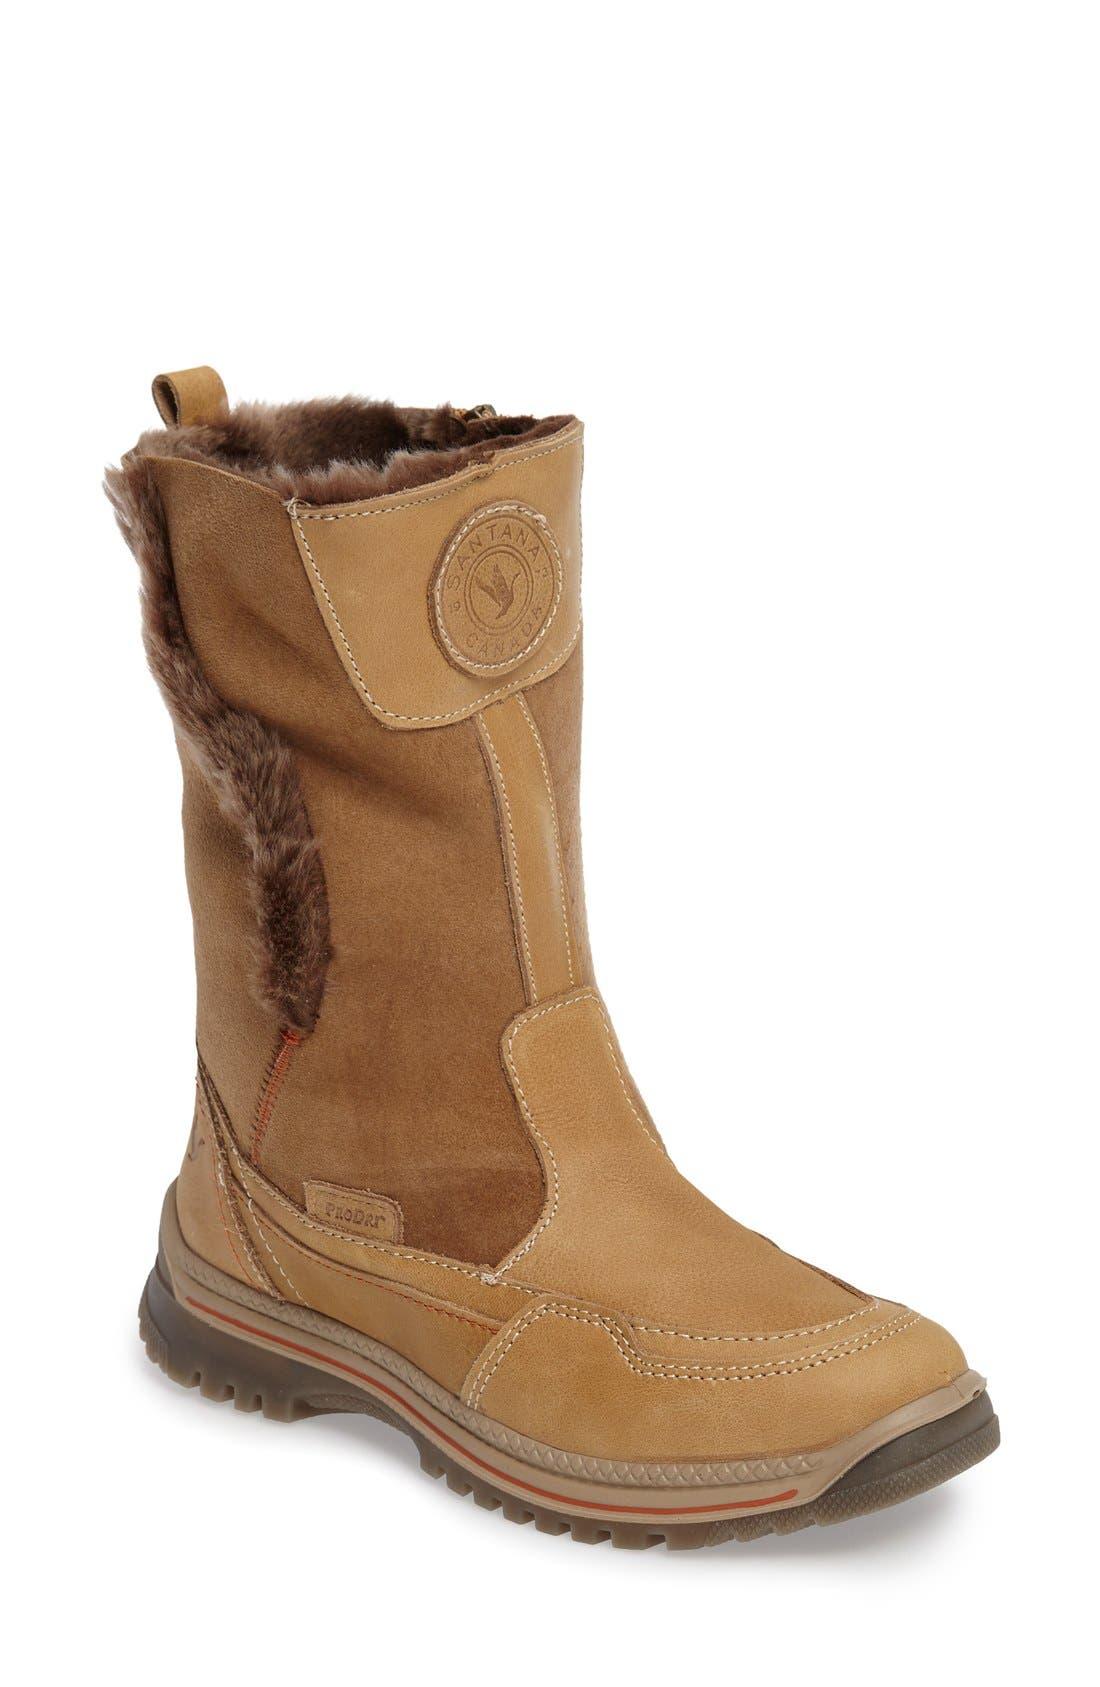 Main Image - Santana Canada Seraphine Genuine Shearling Waterproof Winter Boot (Women) (Wide Calf)